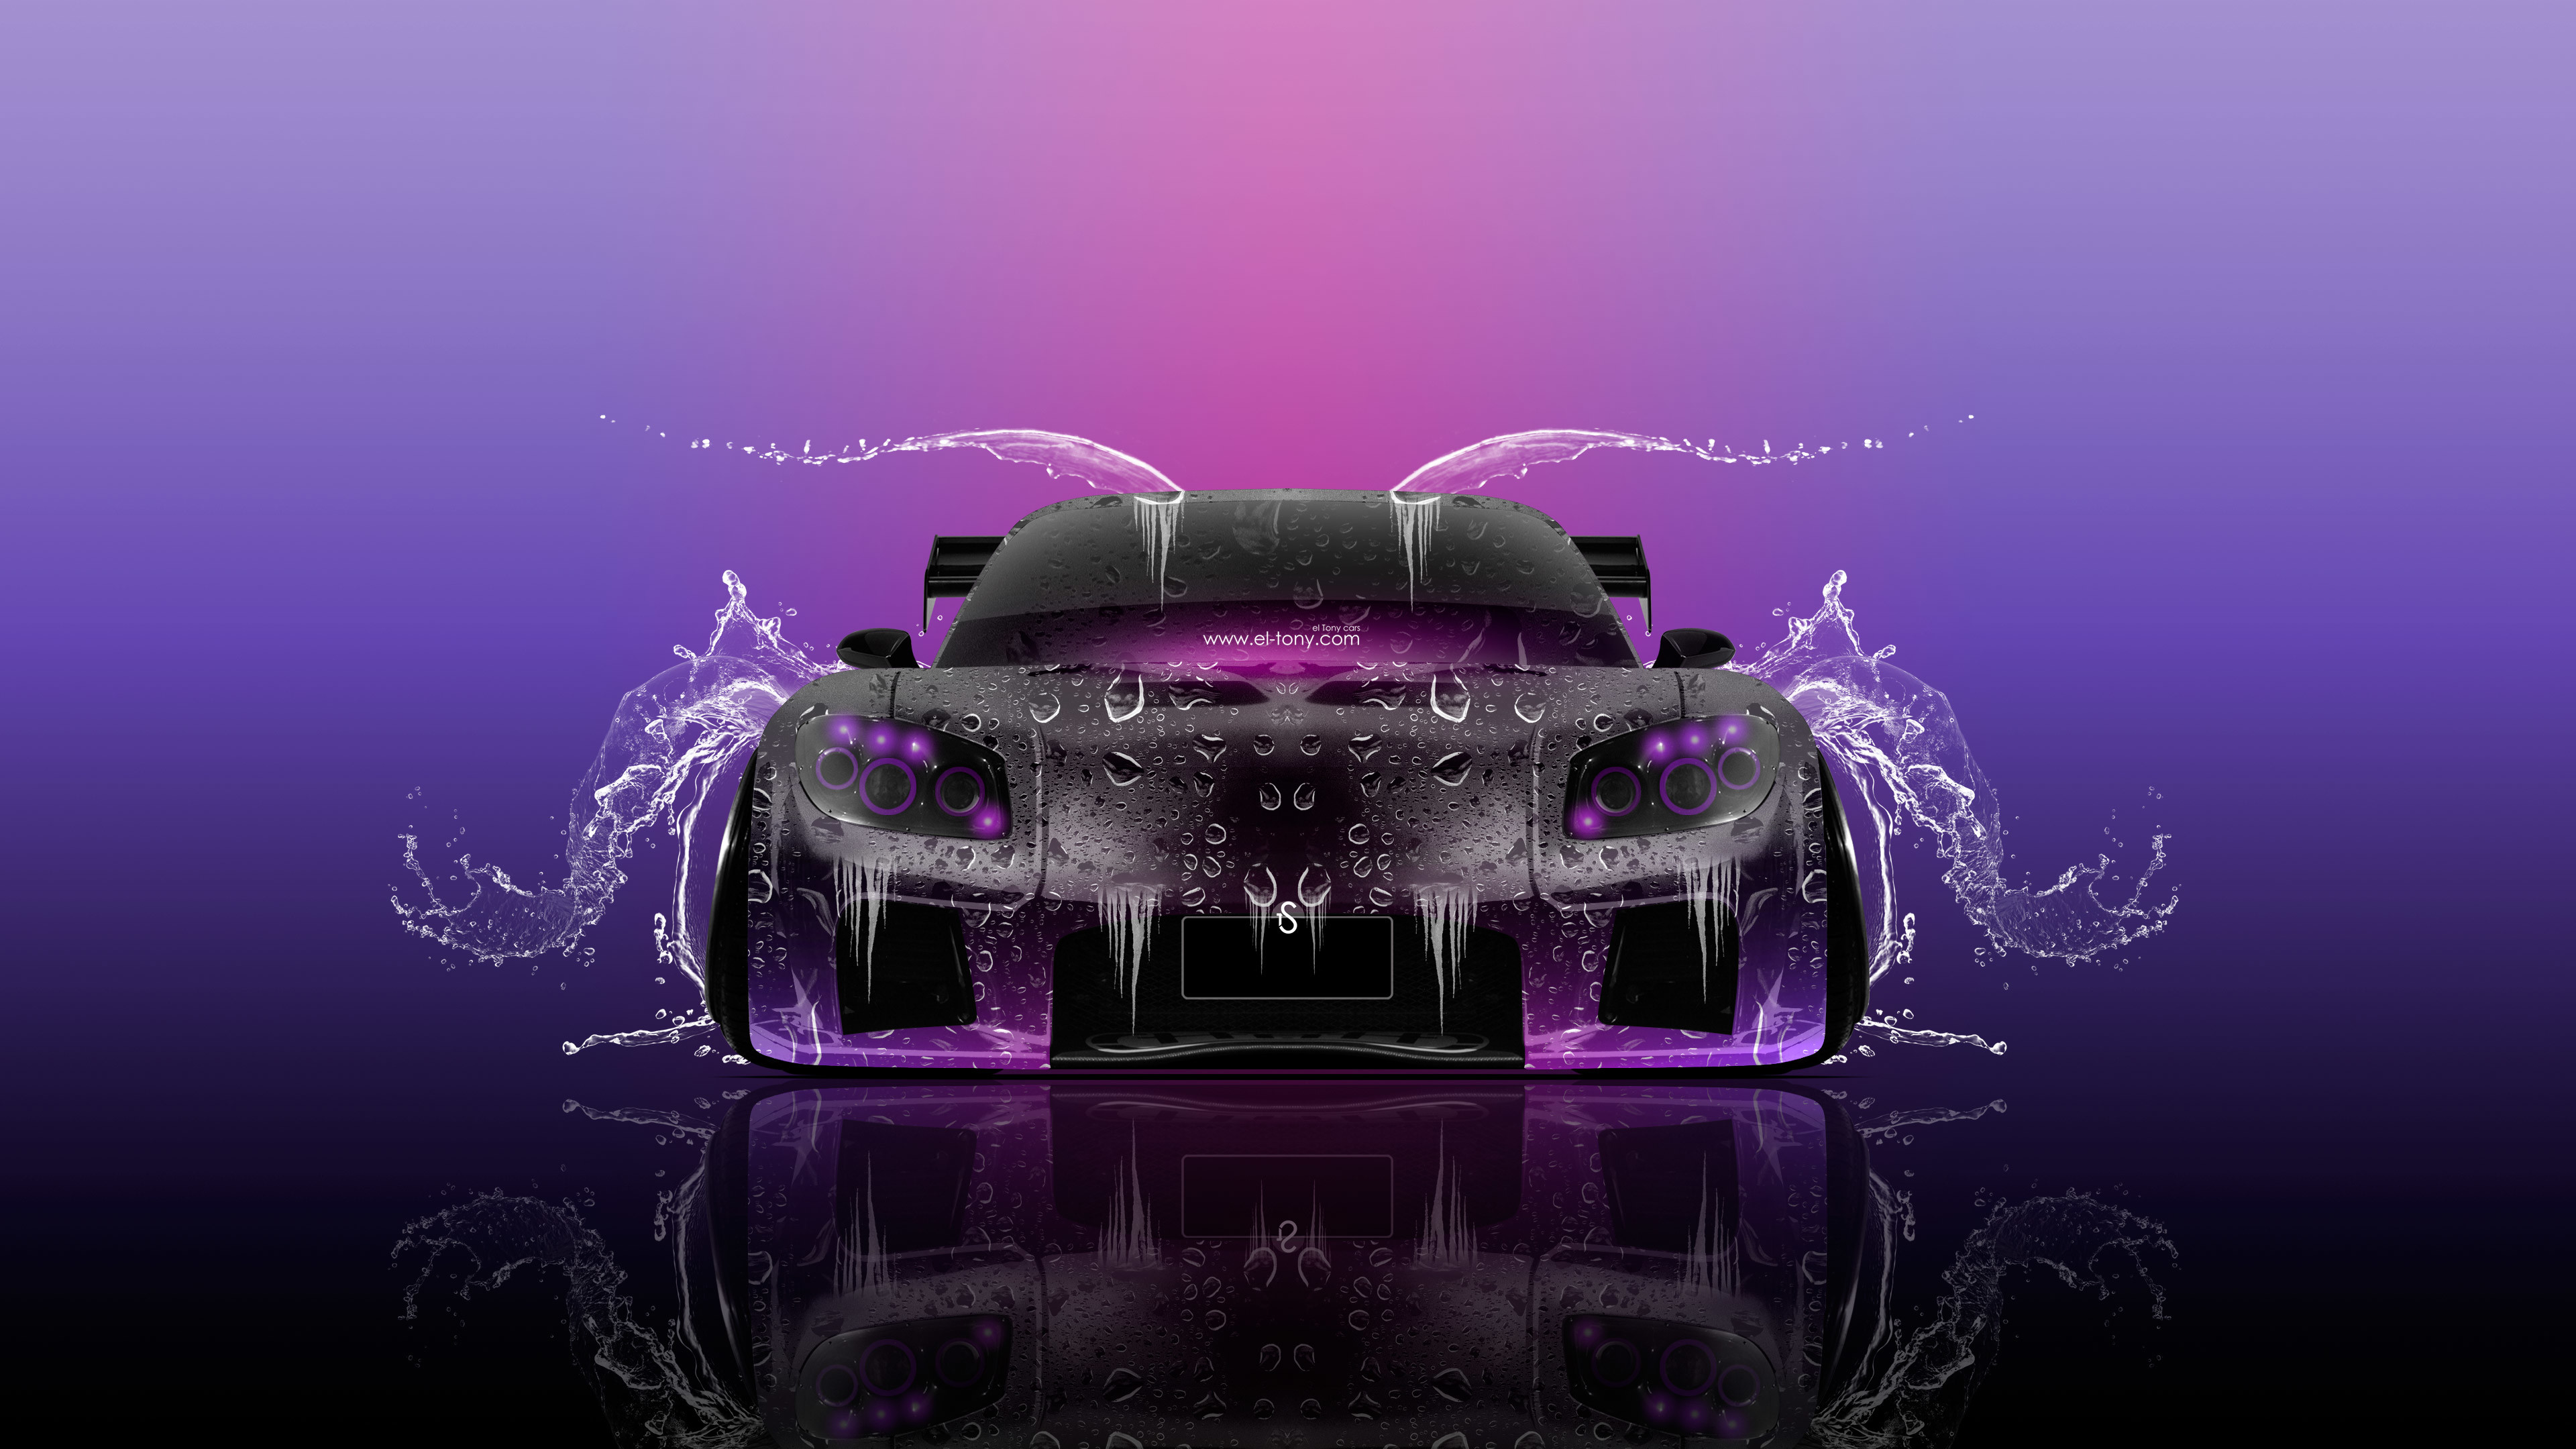 Lovely 1920x1080 Mazda RX7 VeilSide JDM Back Water Car 2014 | El Tony